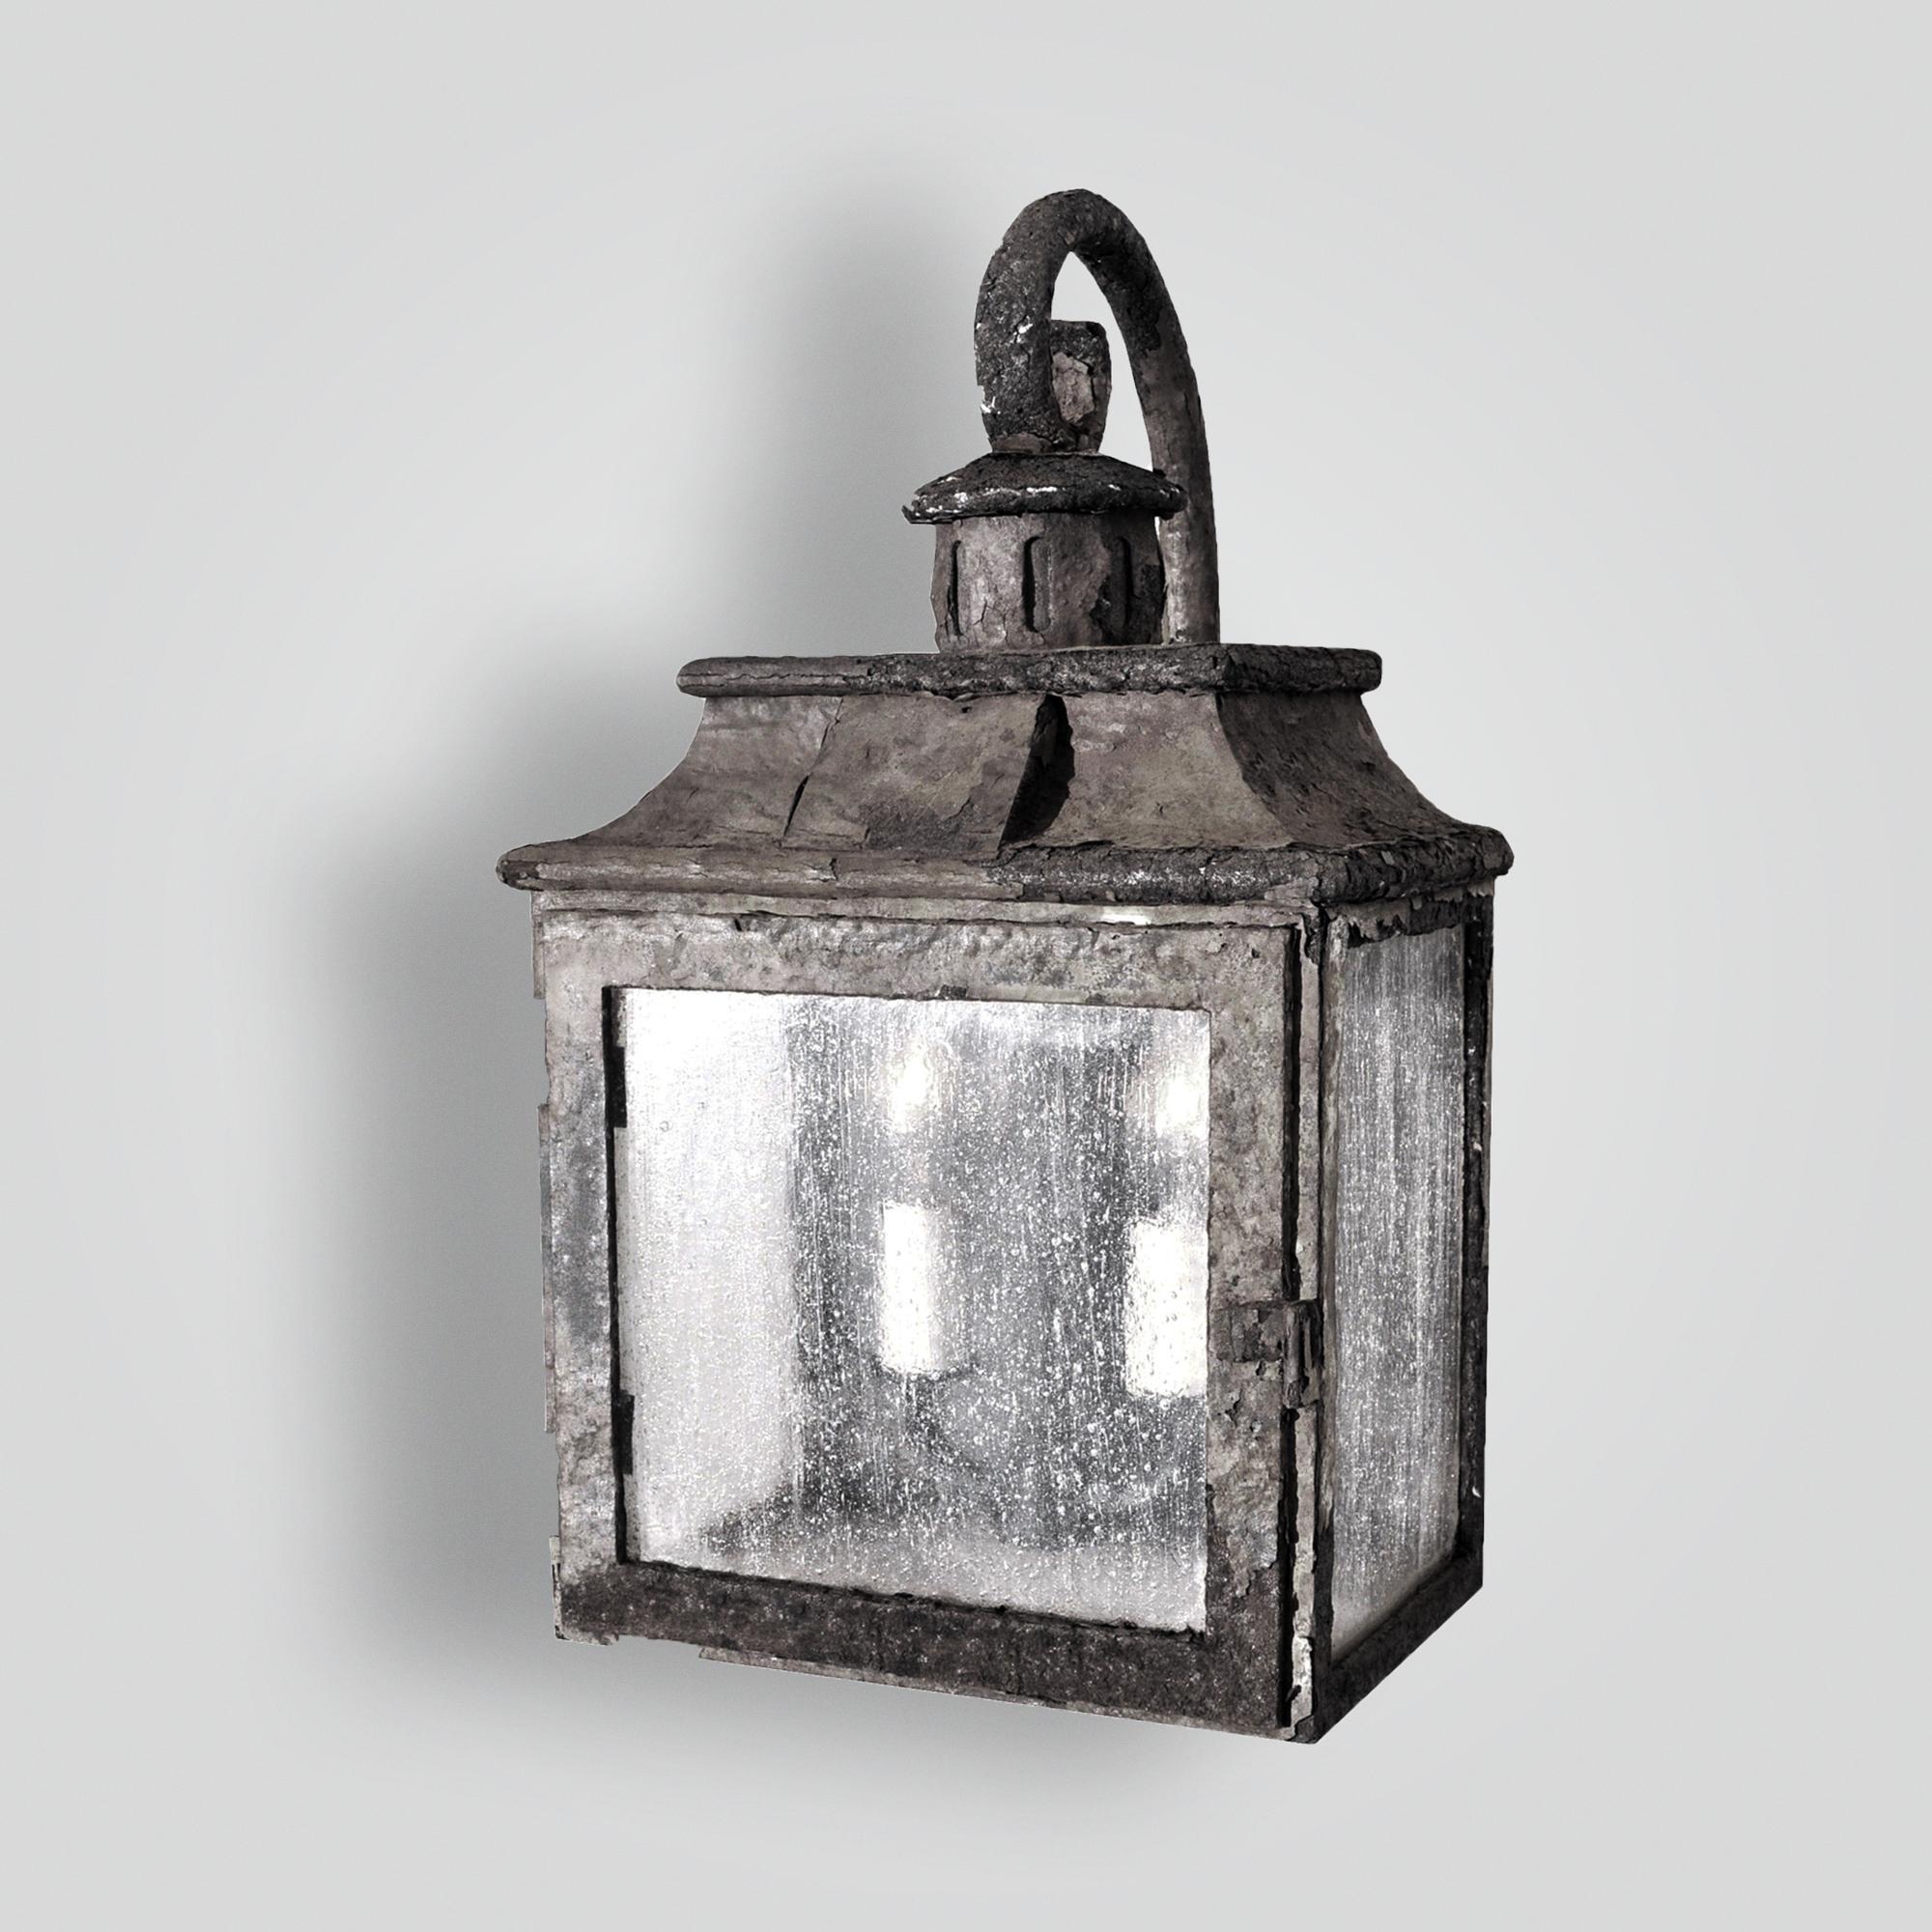 80496-cb2-ir-w-ba Rustic Iron Lantern Wall Light Old World Lighting – ADG Lighting Collection